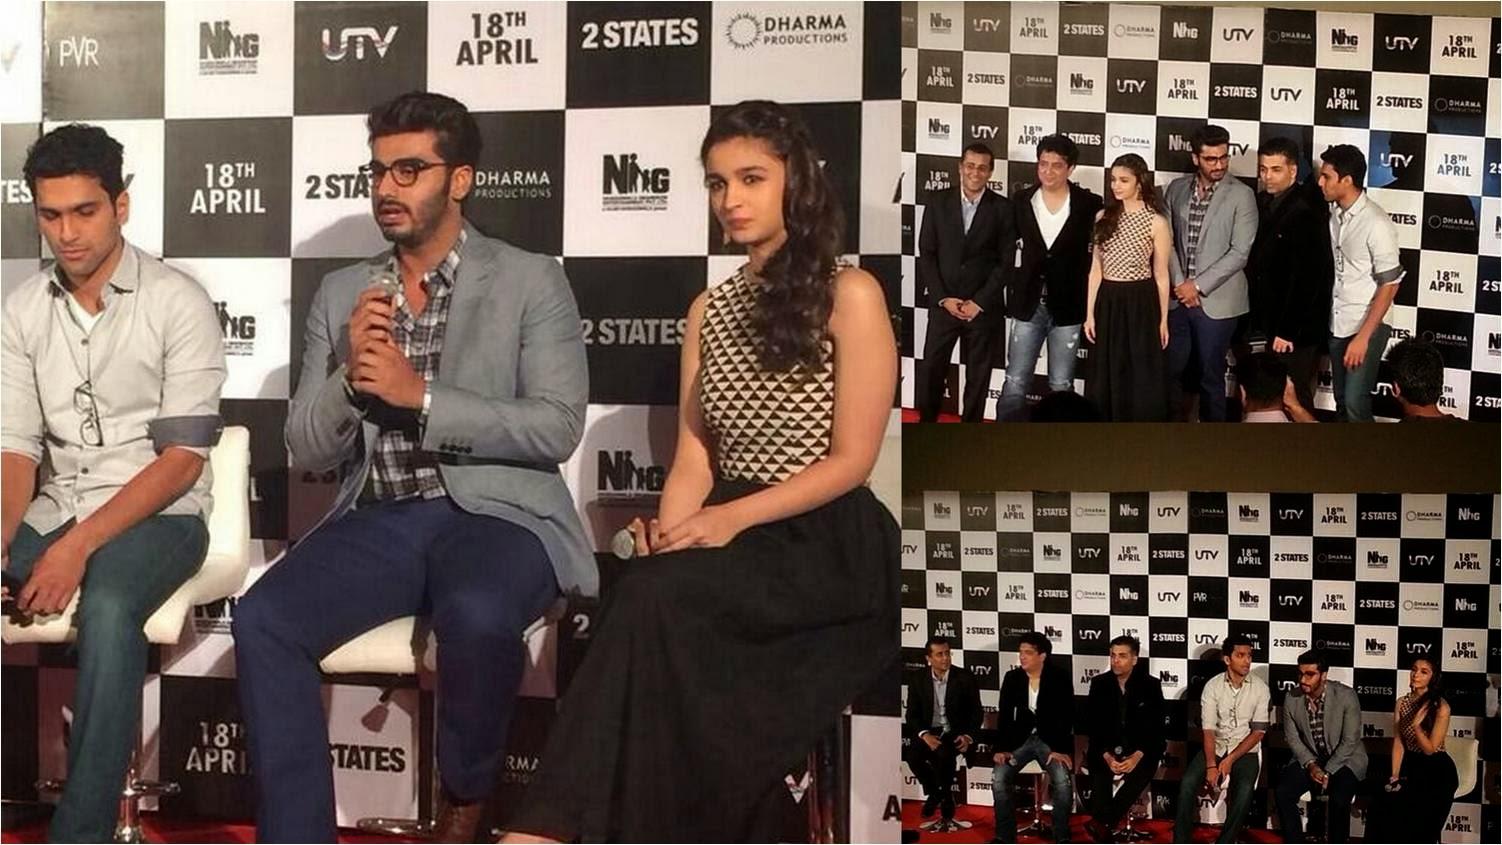 Arjun Kapoor, Alia Bhatt, Karan Johar, Sajid Nadiadwala and team of 2 States at official trailer launch event